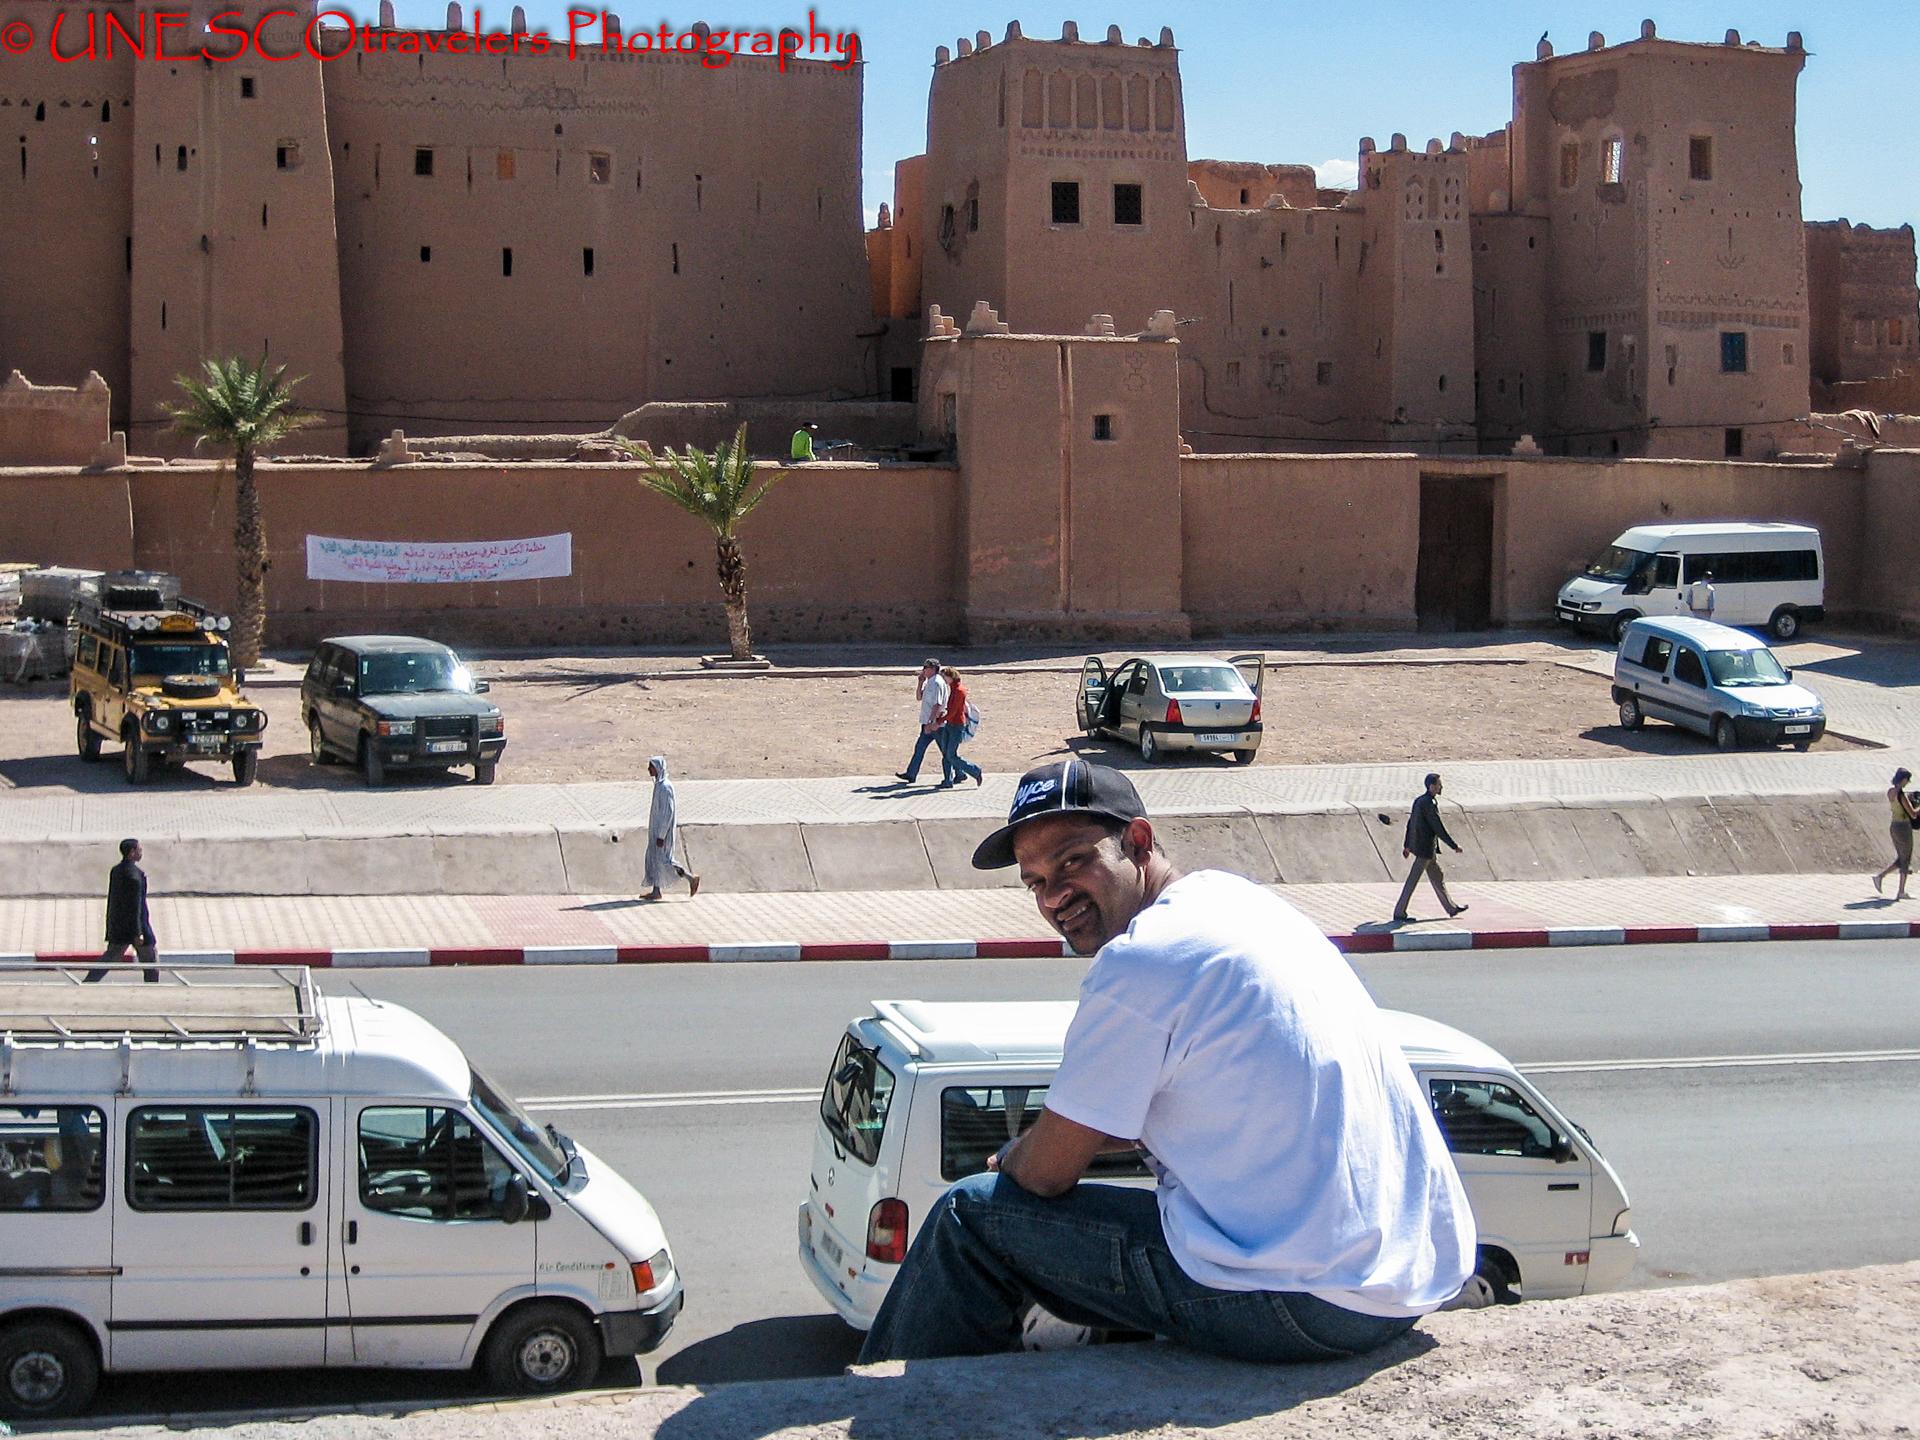 Moroccan Medinas Medina of Essaouira (formerly Mogador) - Morocco By UNESCOtravelers